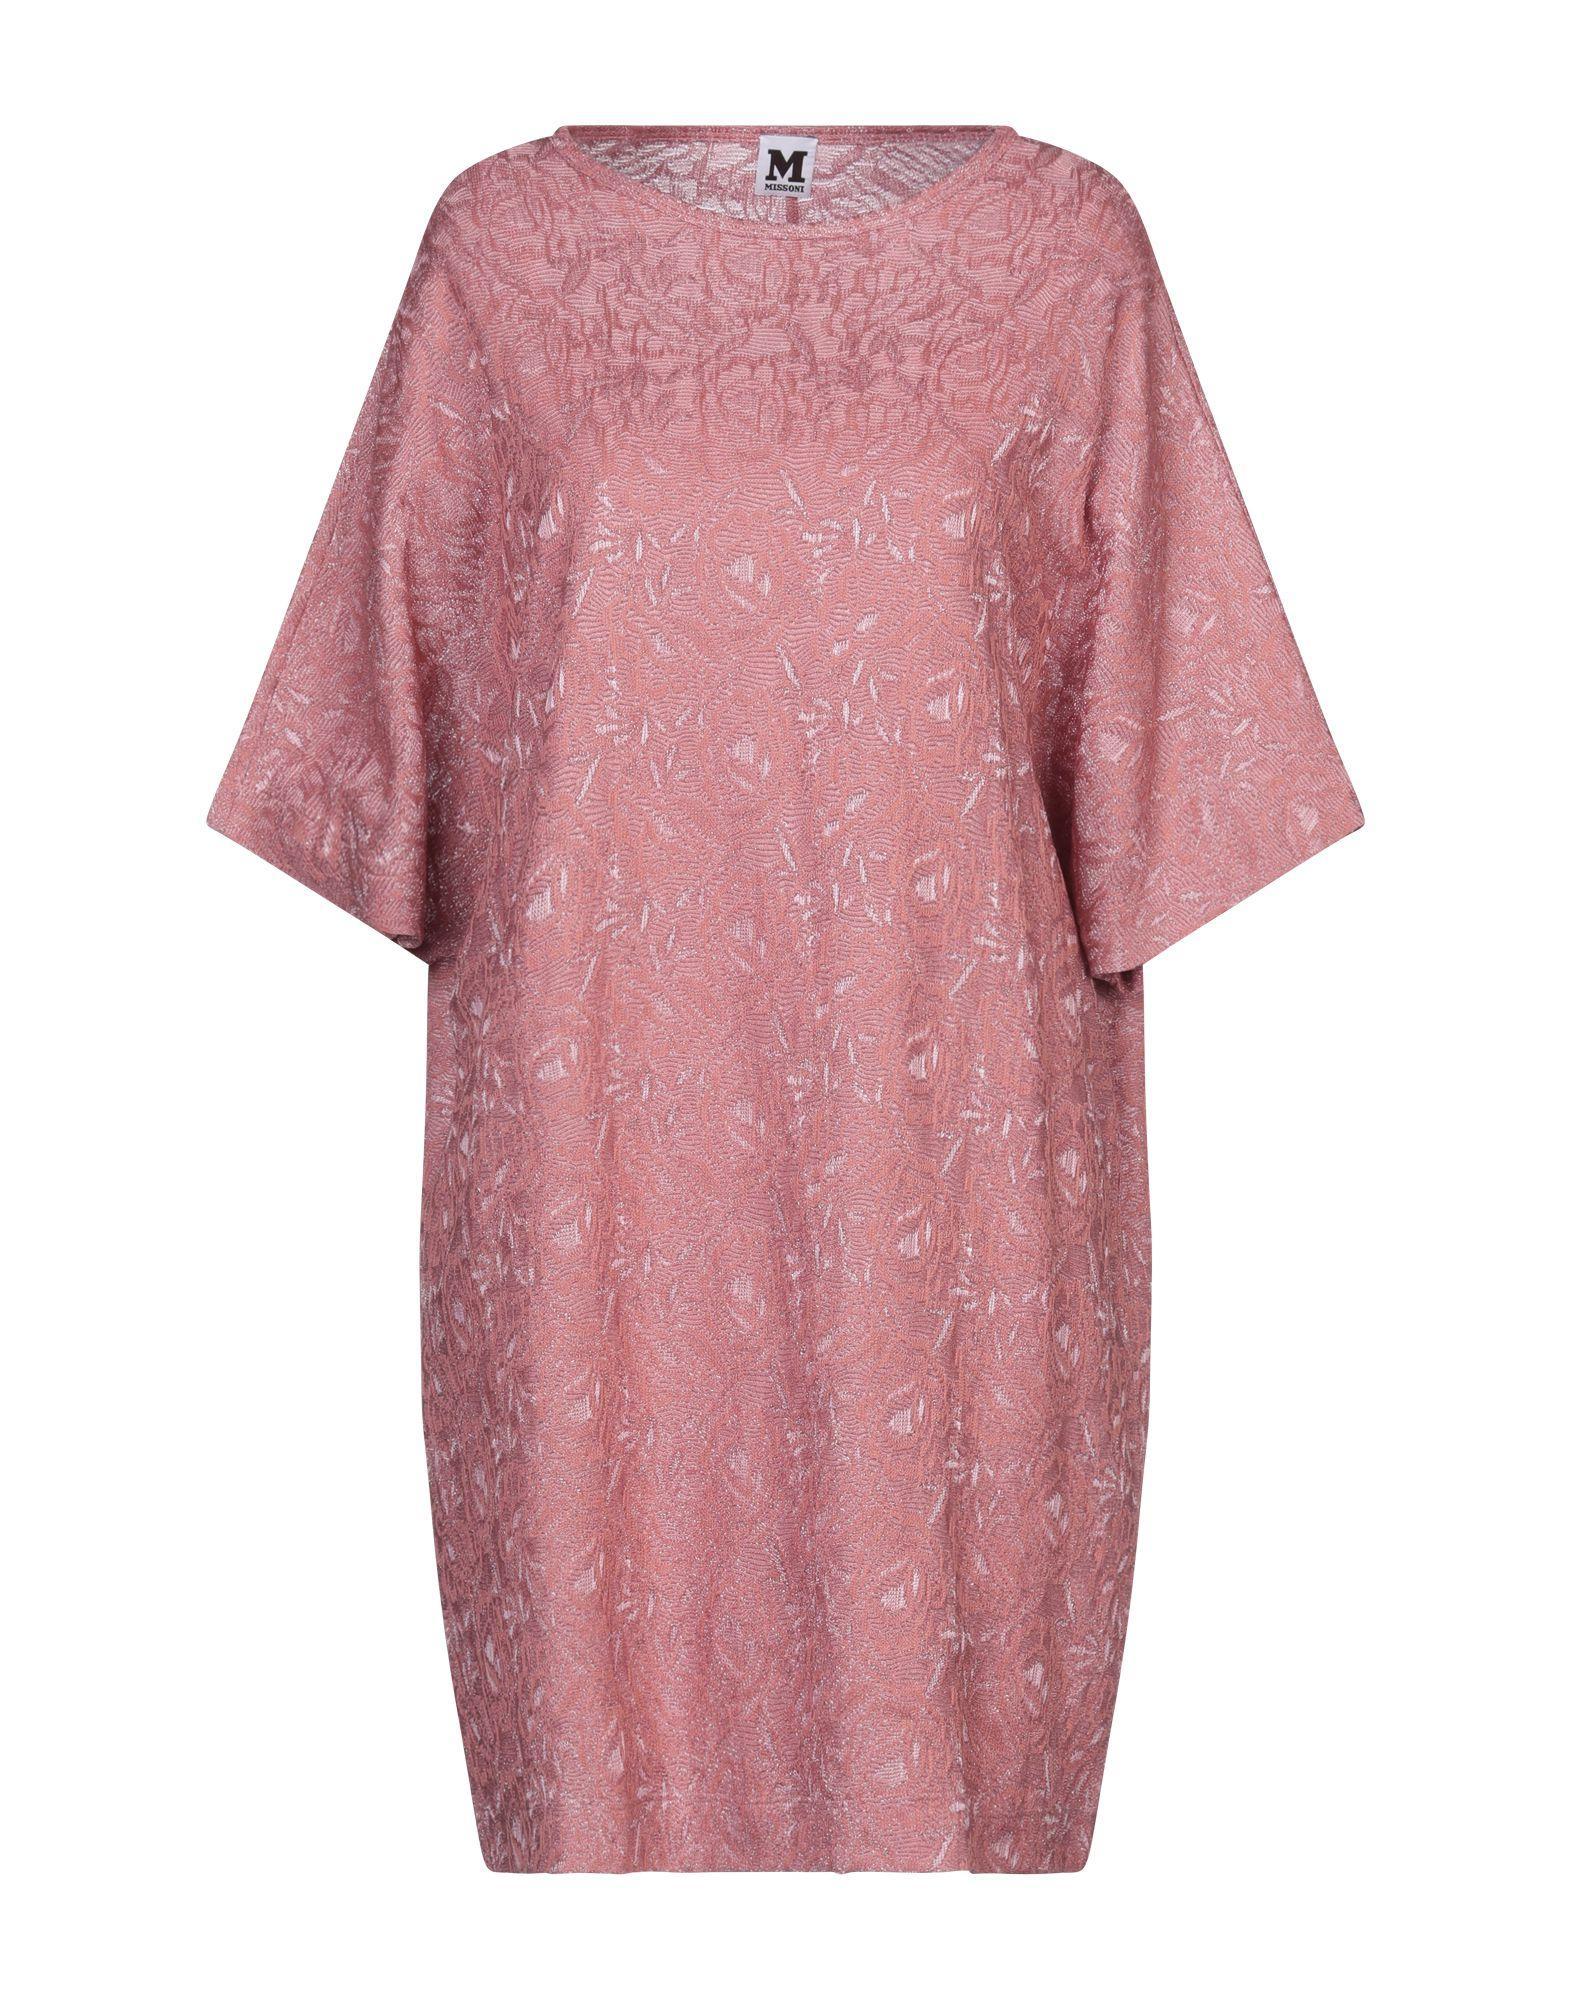 Короткое платье  - Бежевый,Серый цвет